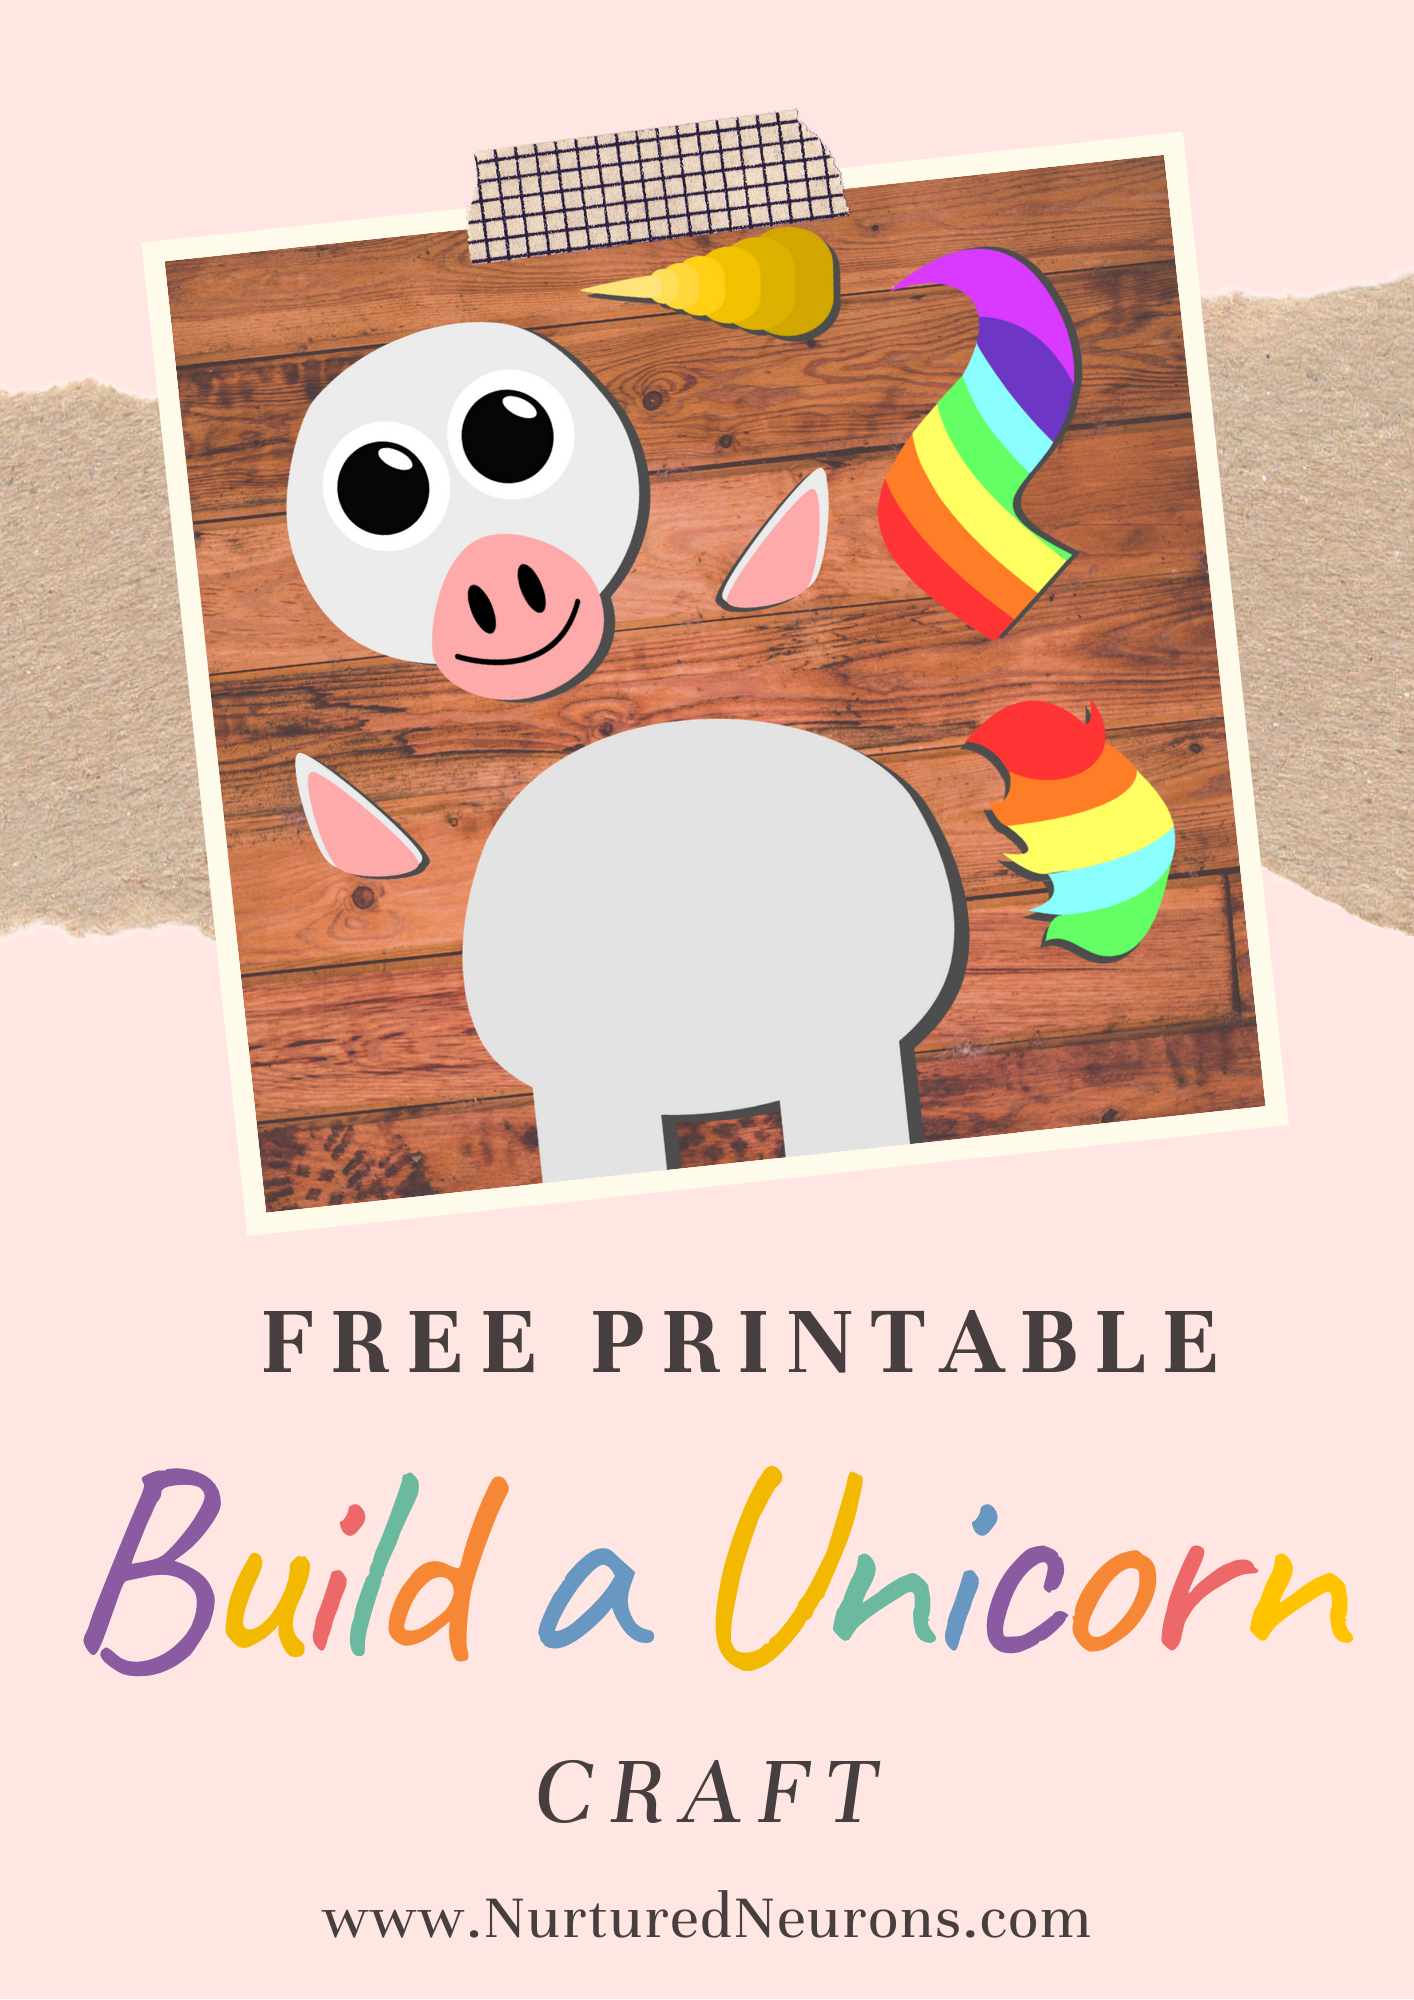 Build A Unicorn Craft Free Printable